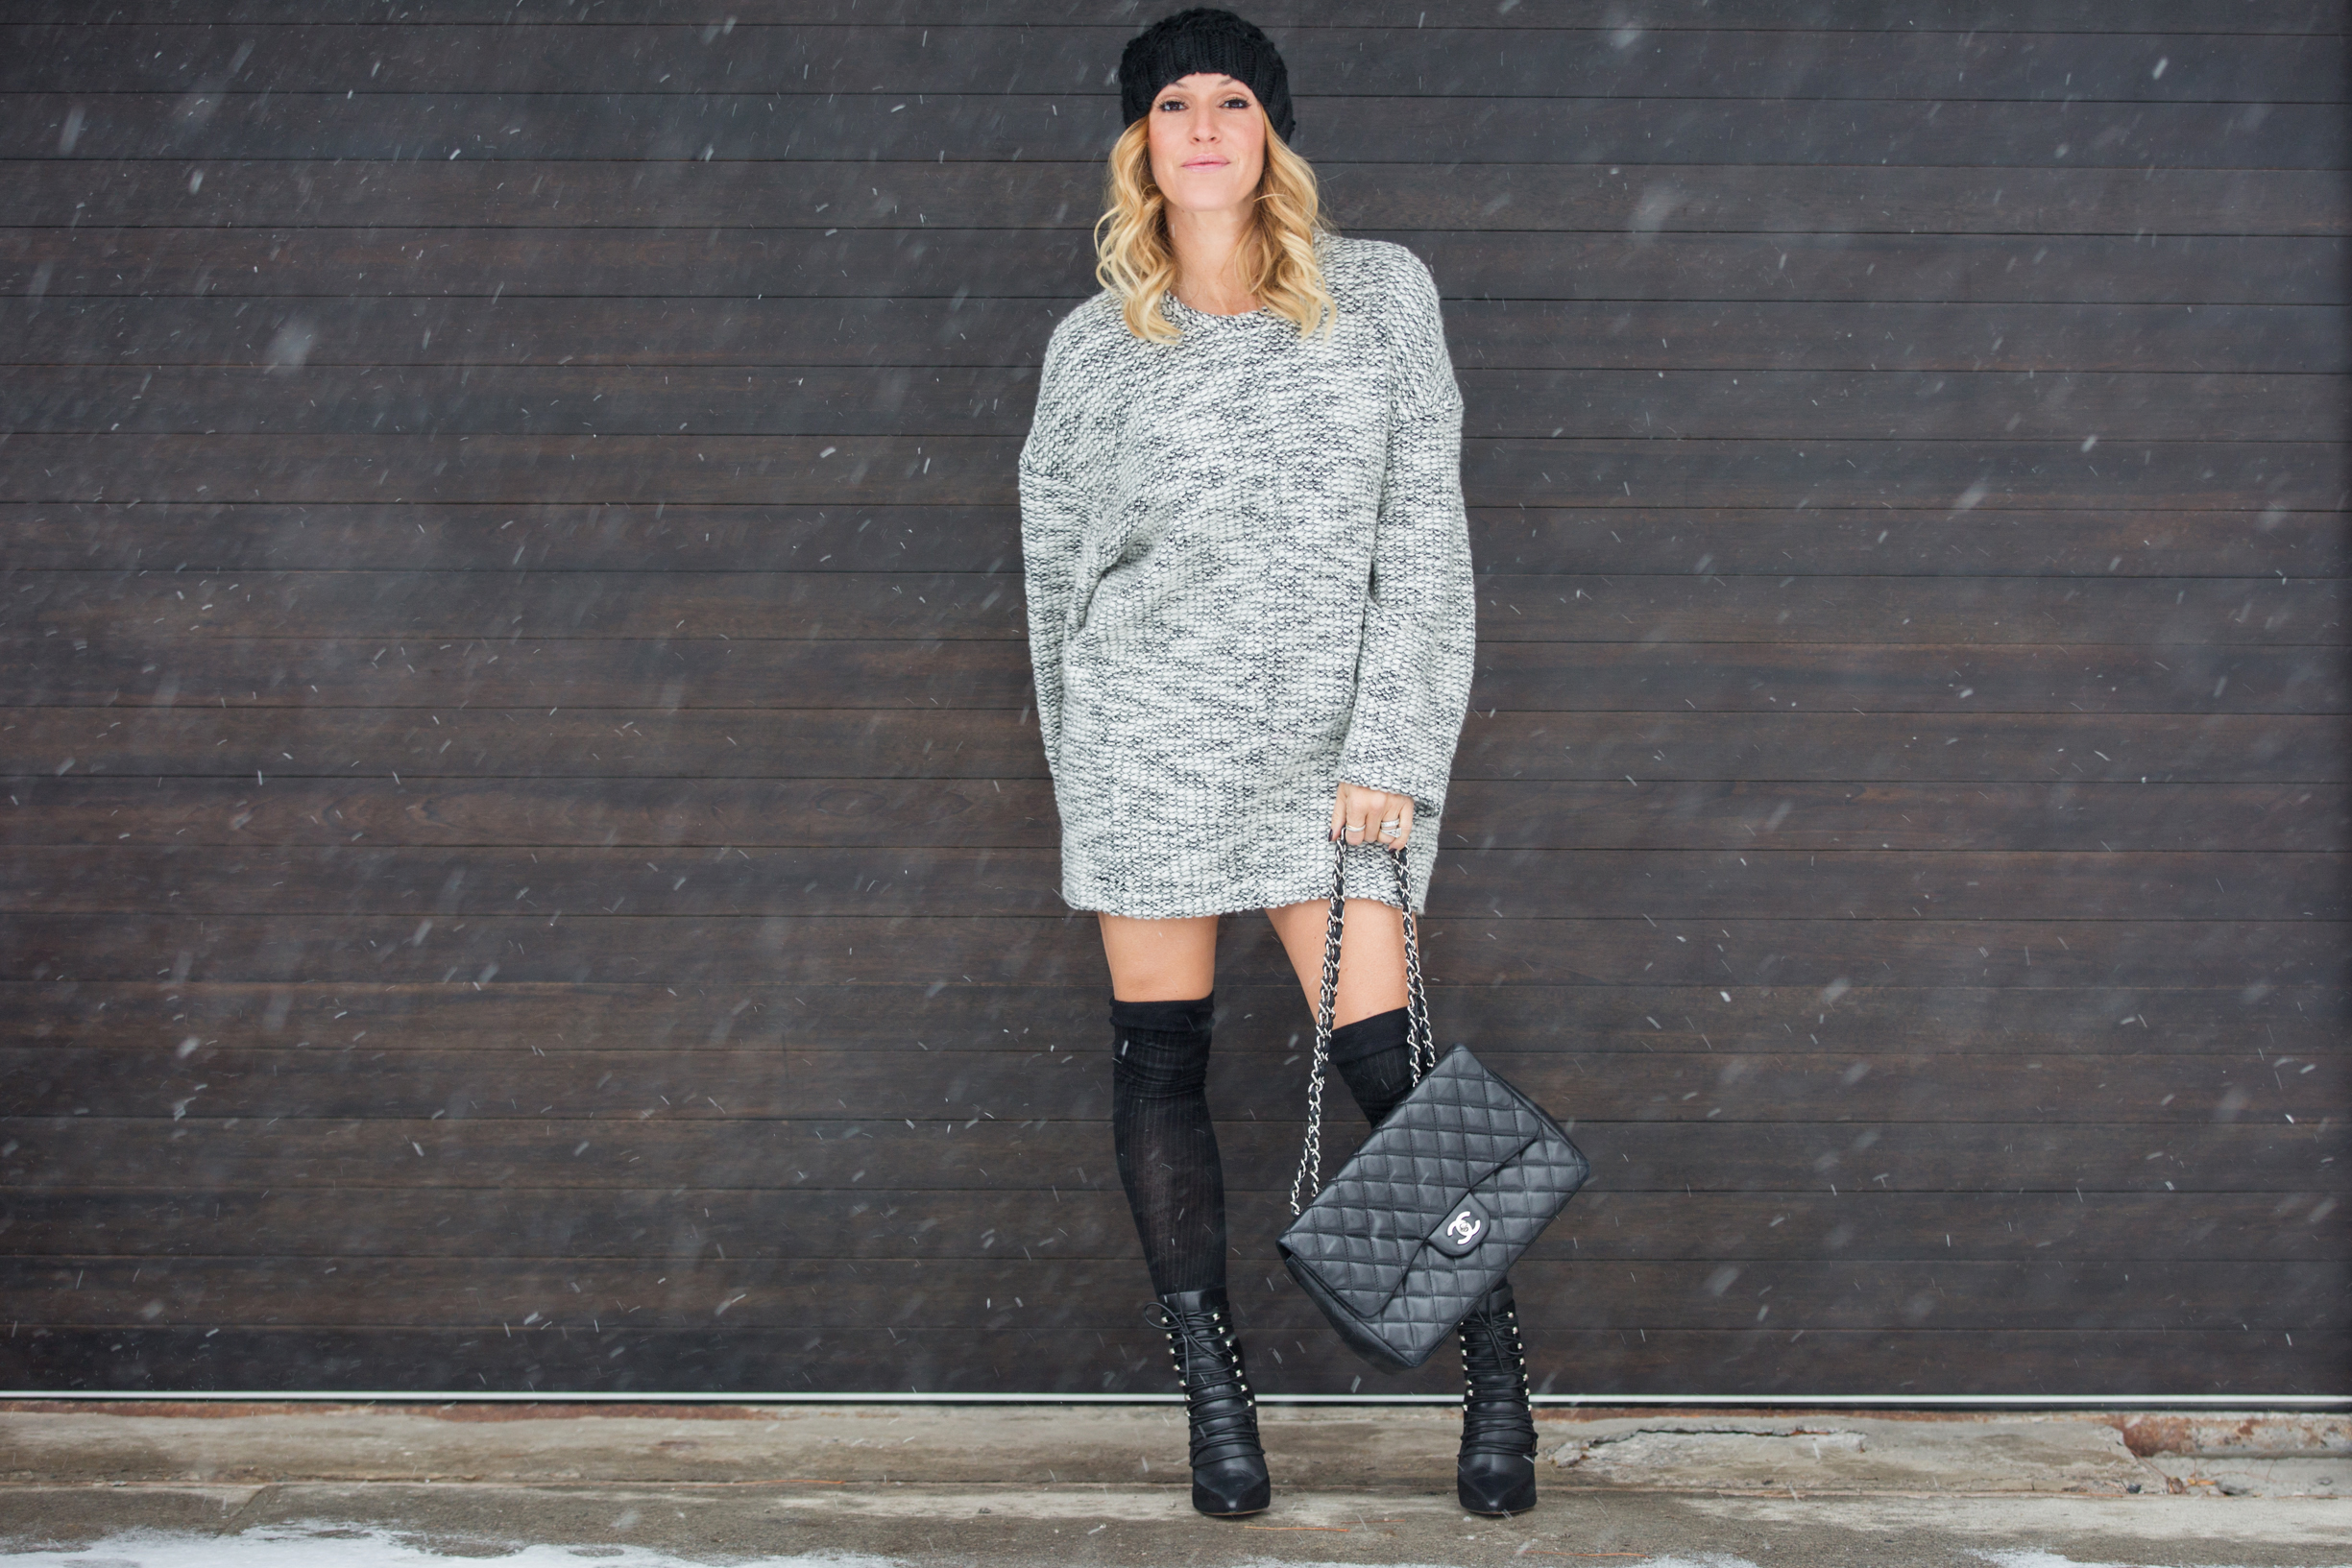 mademoiselle jules sweater weather fashion post blog